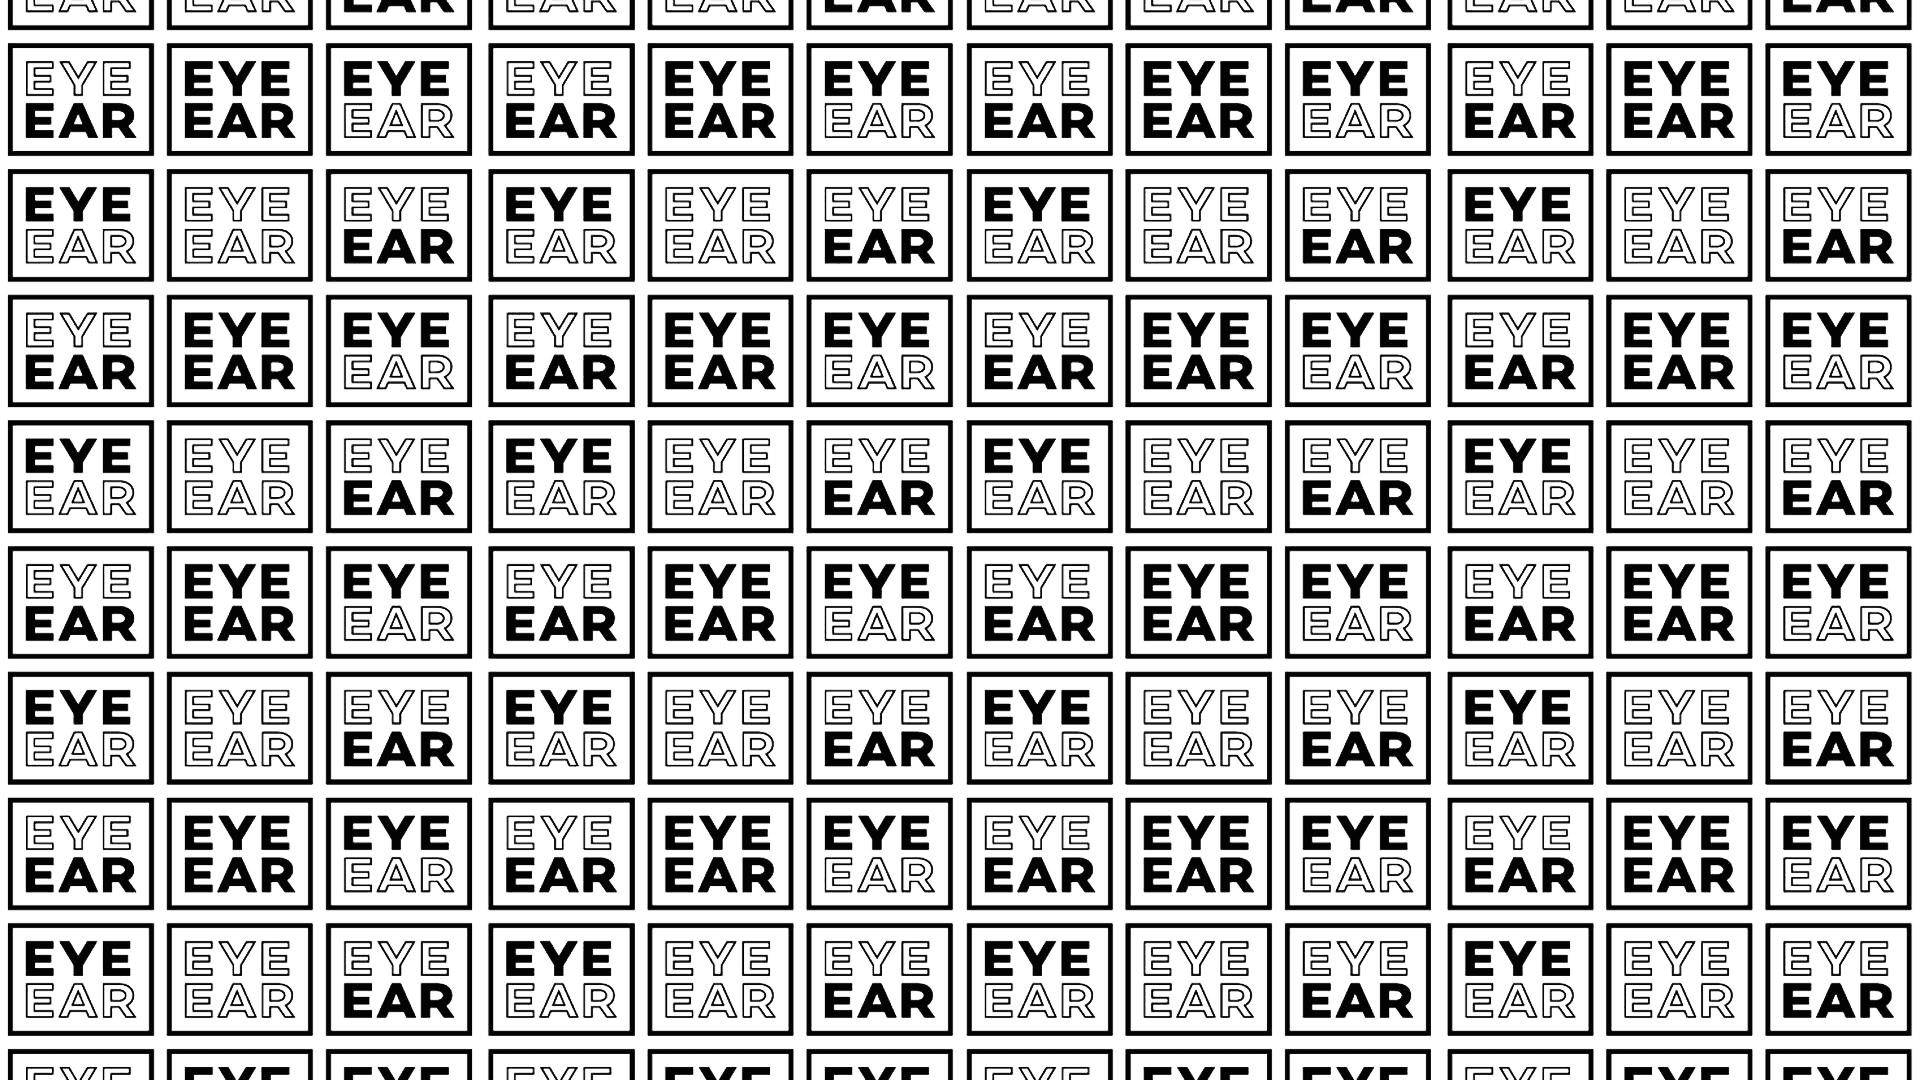 SSWeb-EyeEar-Pattern-Divider